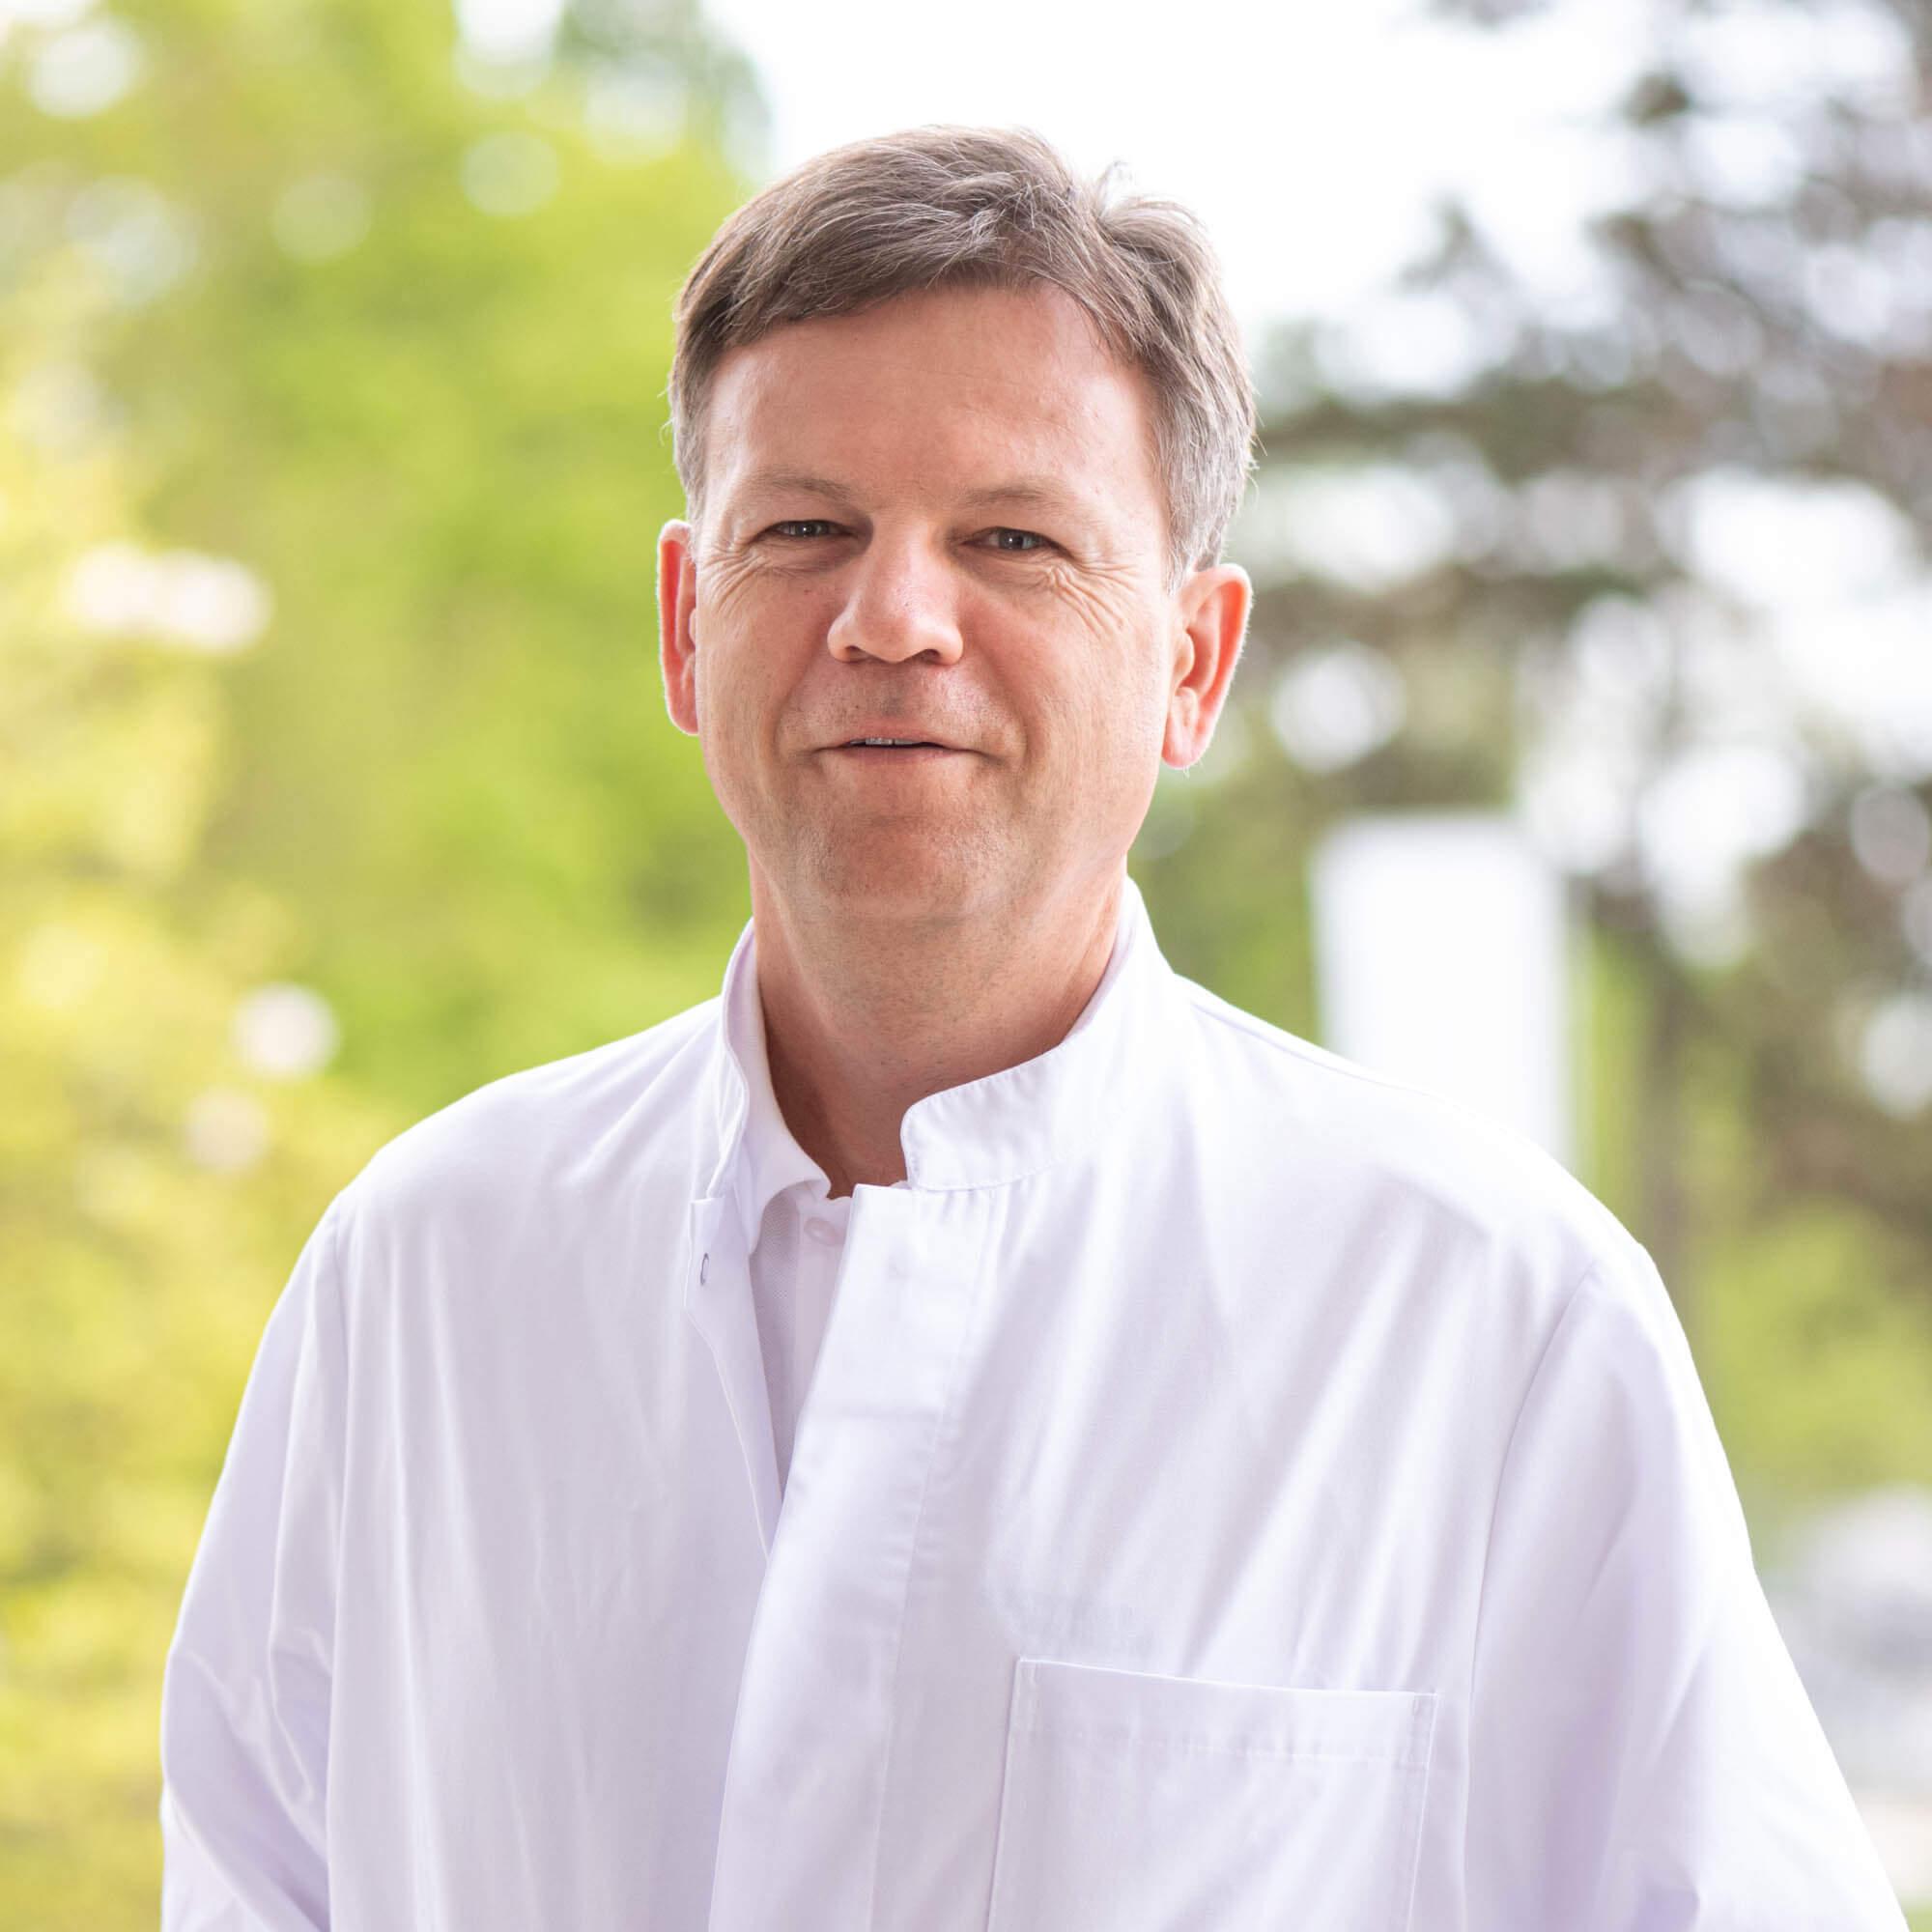 Dra. Rainer Harfmann